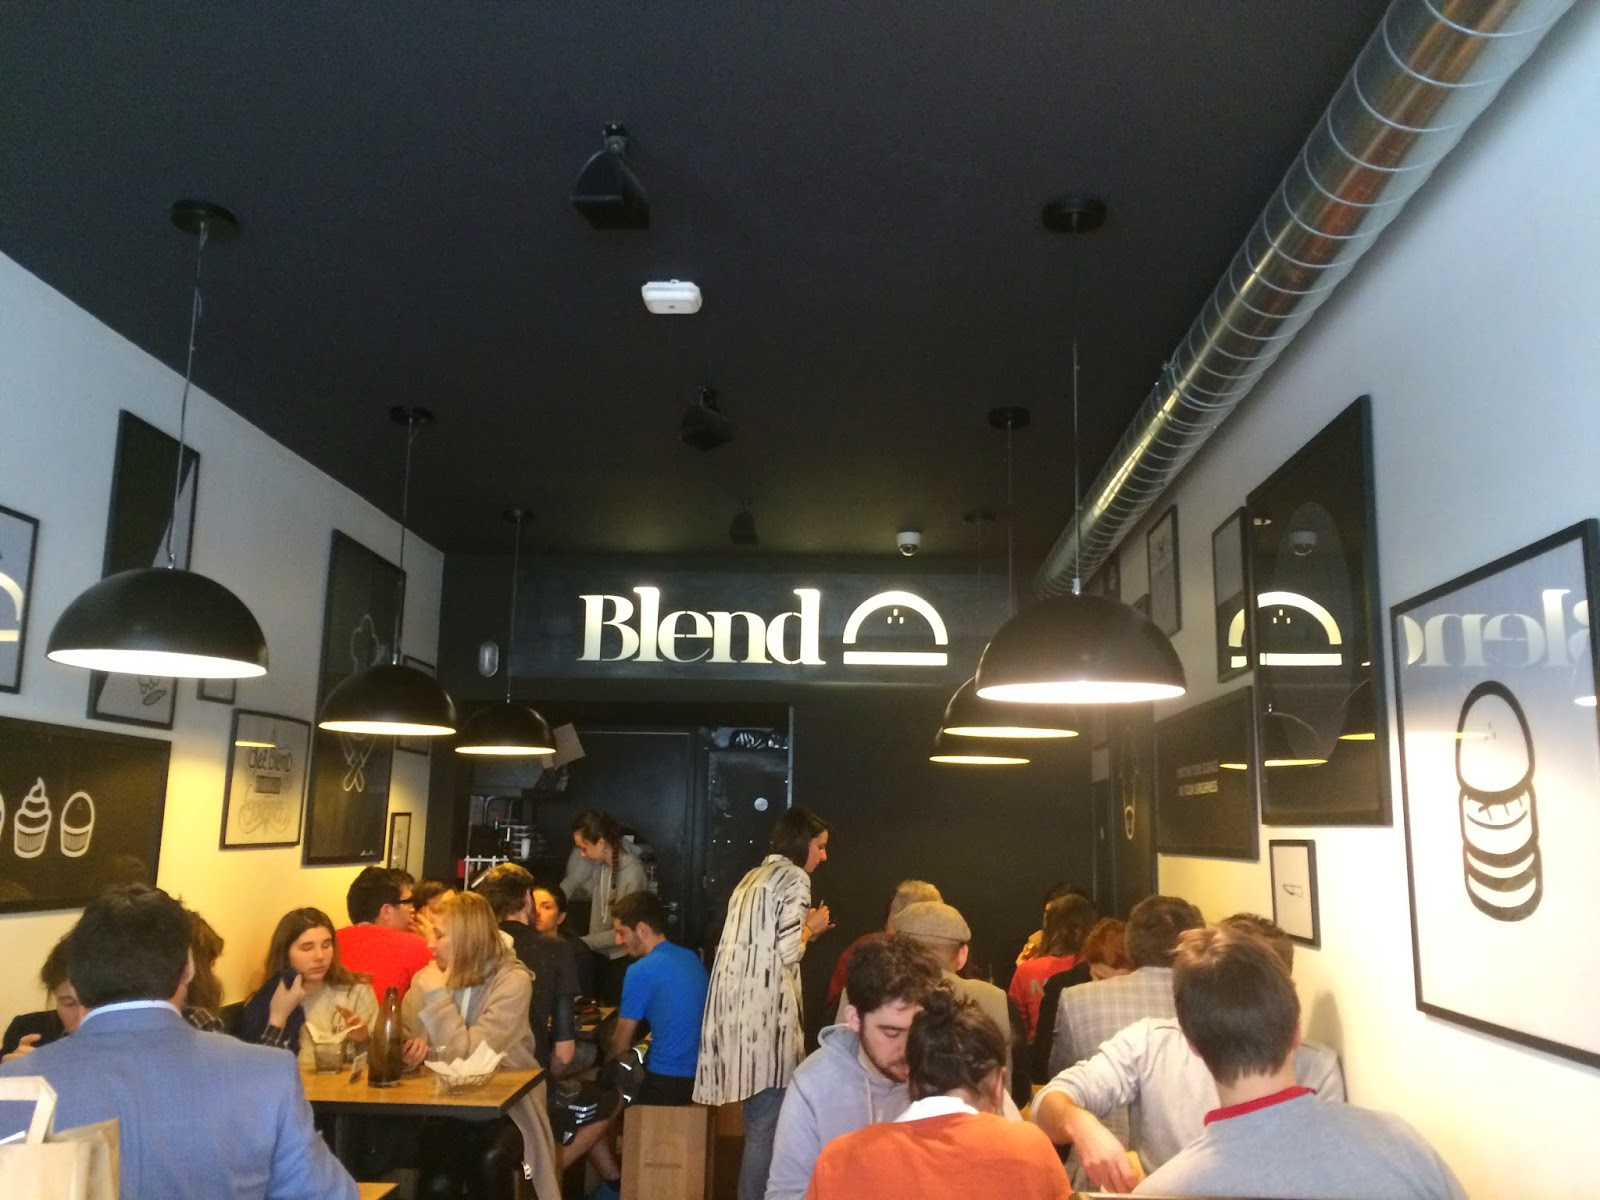 Interior of Blend, rue d'Argout, Paris